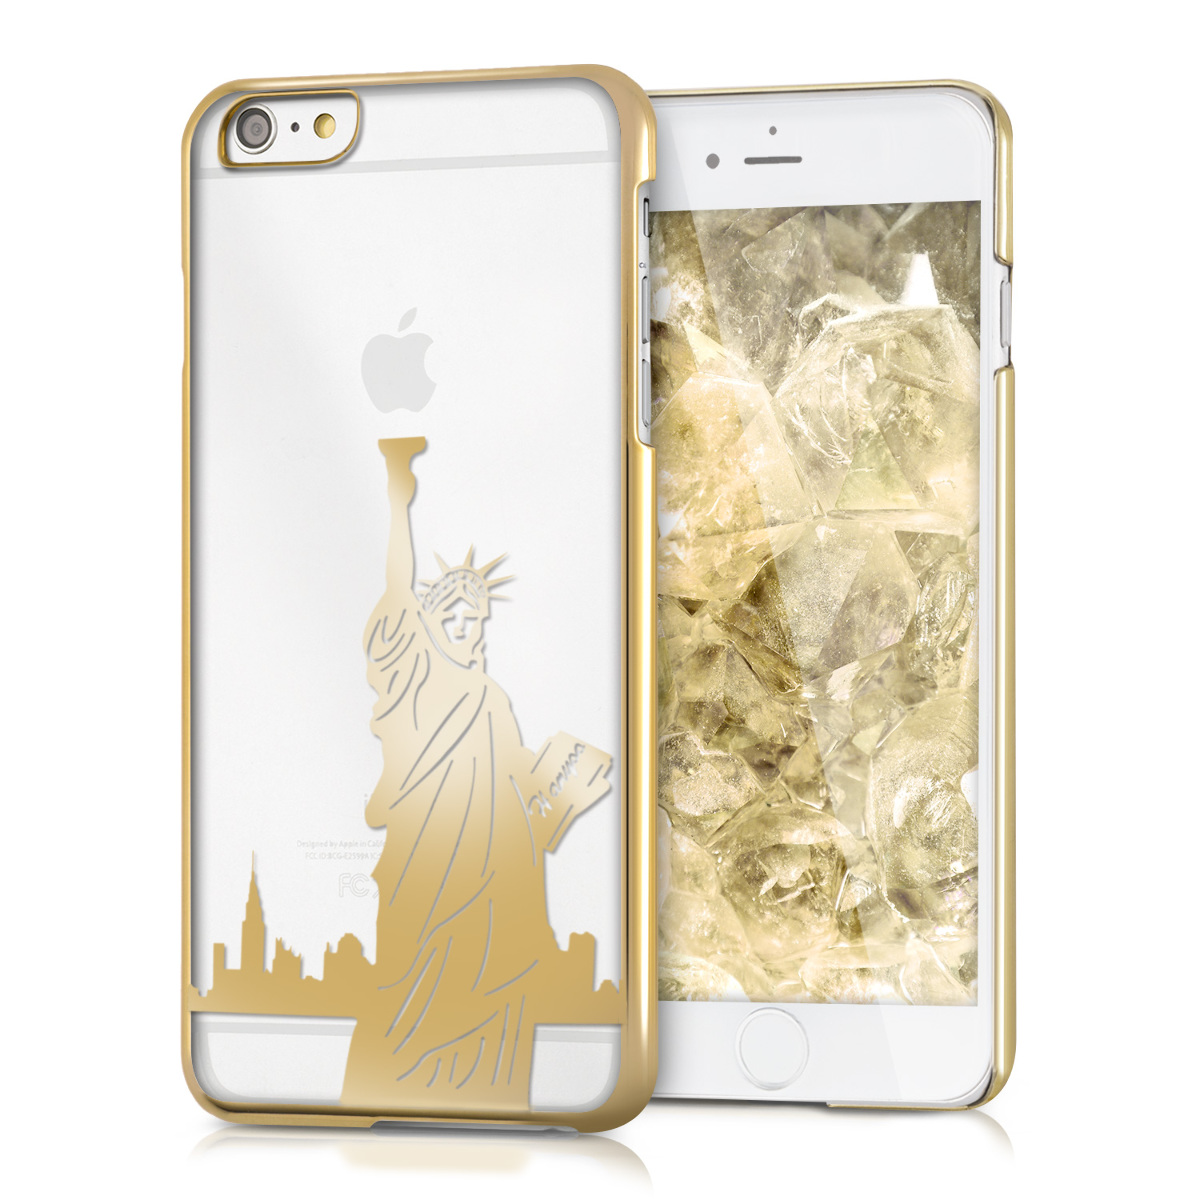 Kvalitní plastové pouzdro pro Apple iPhone 6 Plus / 6S - Statue of Liberty Gold | Transparent